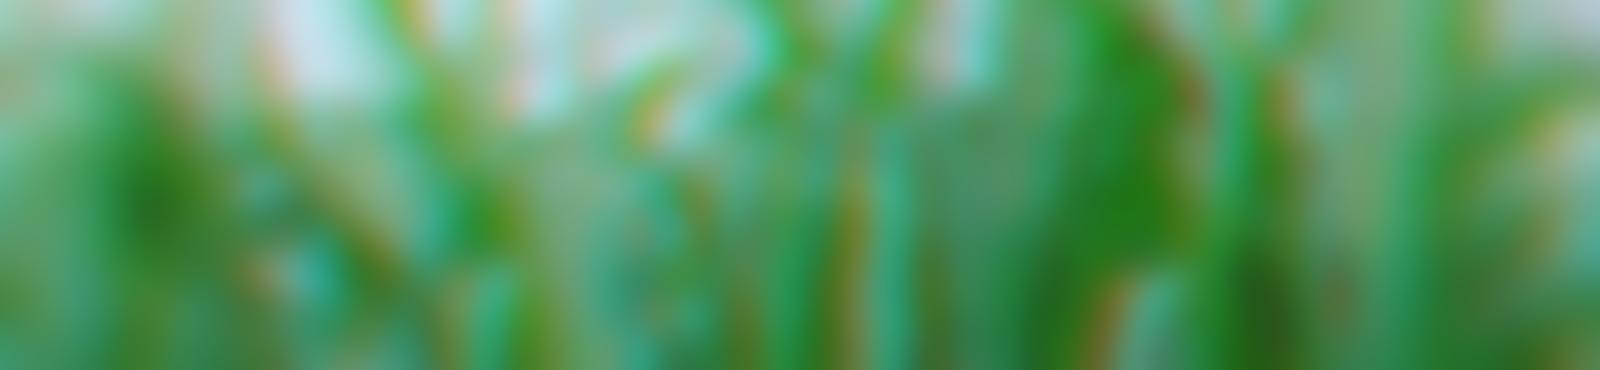 Blurred e4cebd56 ac01 4788 9e25 b057c13aab86